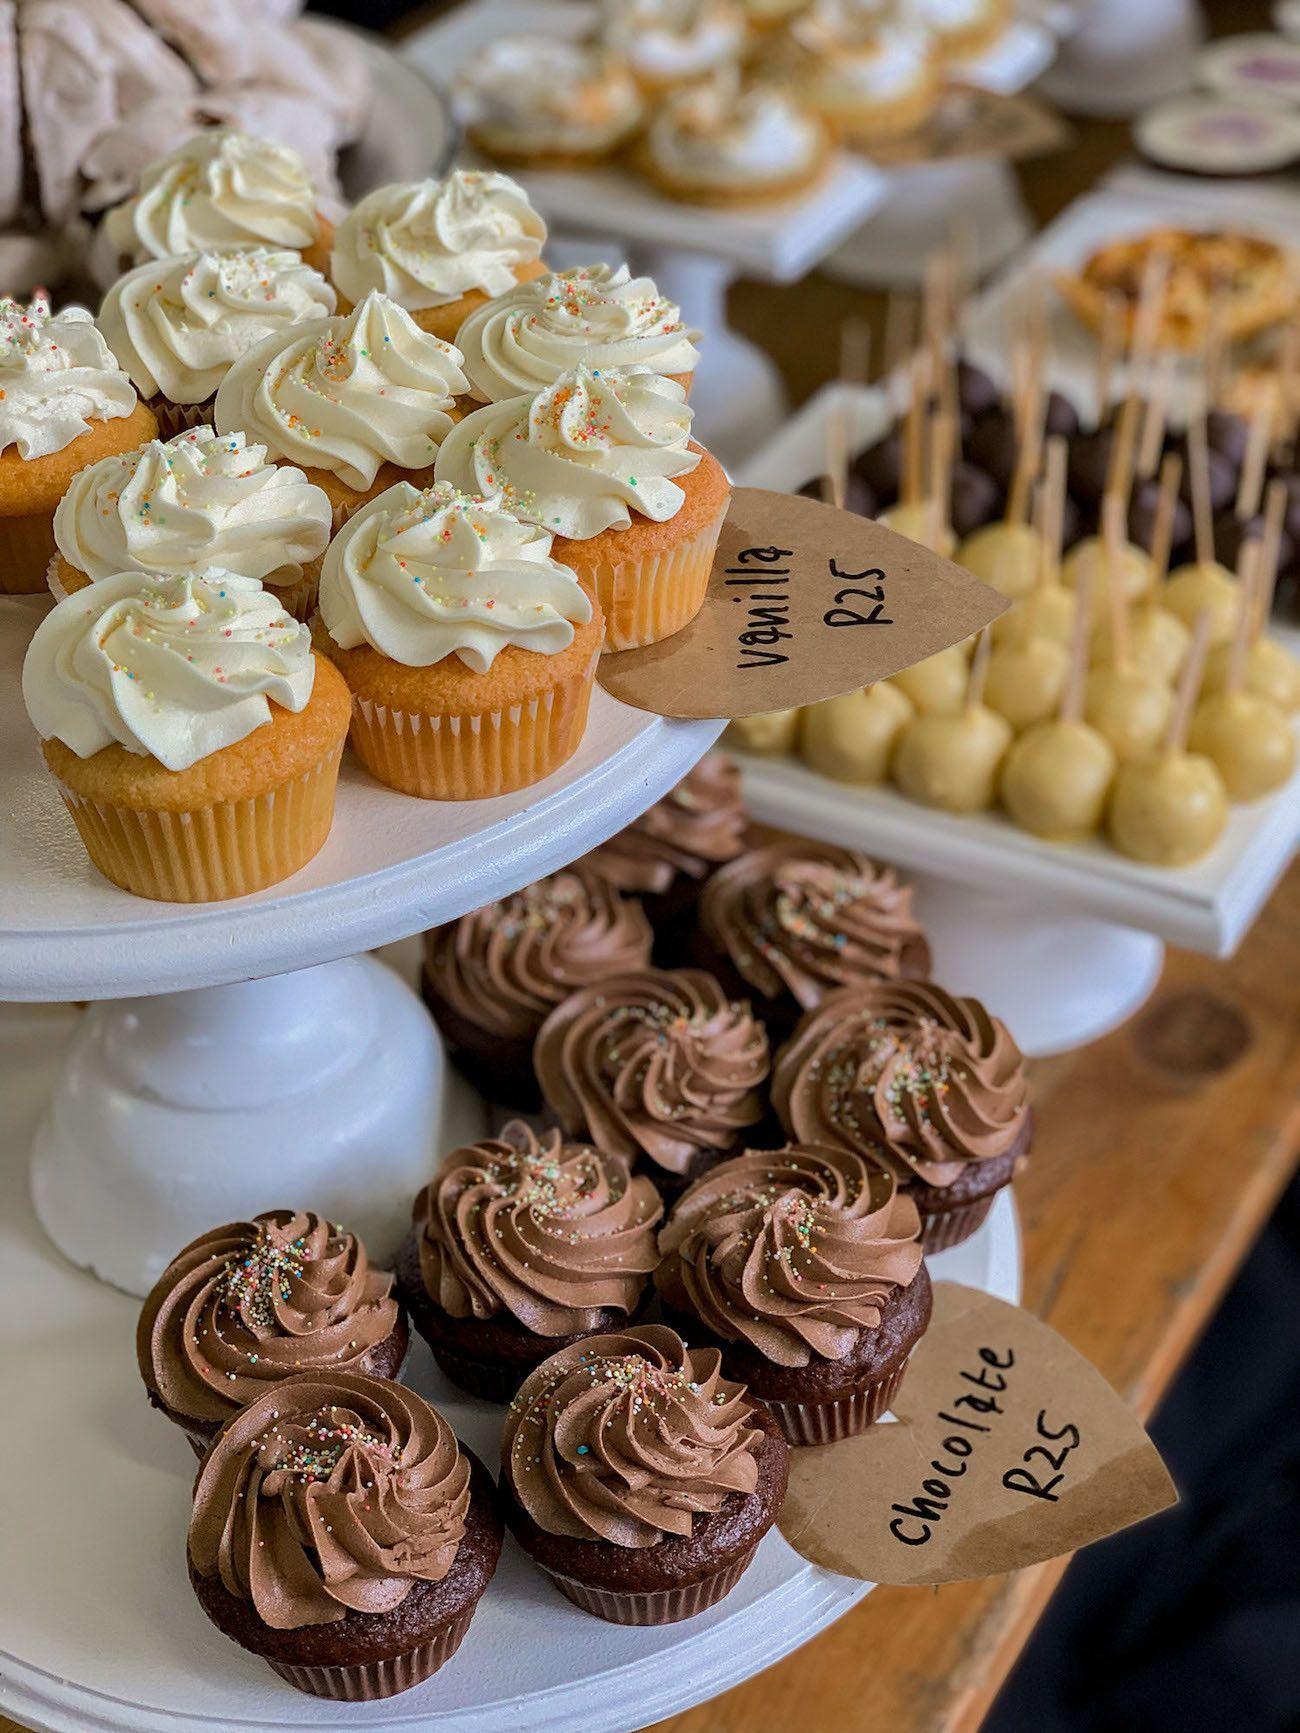 Frühstücks - und Brunch Guide für Kapstadt, Oranjezicht City Farm Market, Cup Cakes, Cake Pops, Süßes